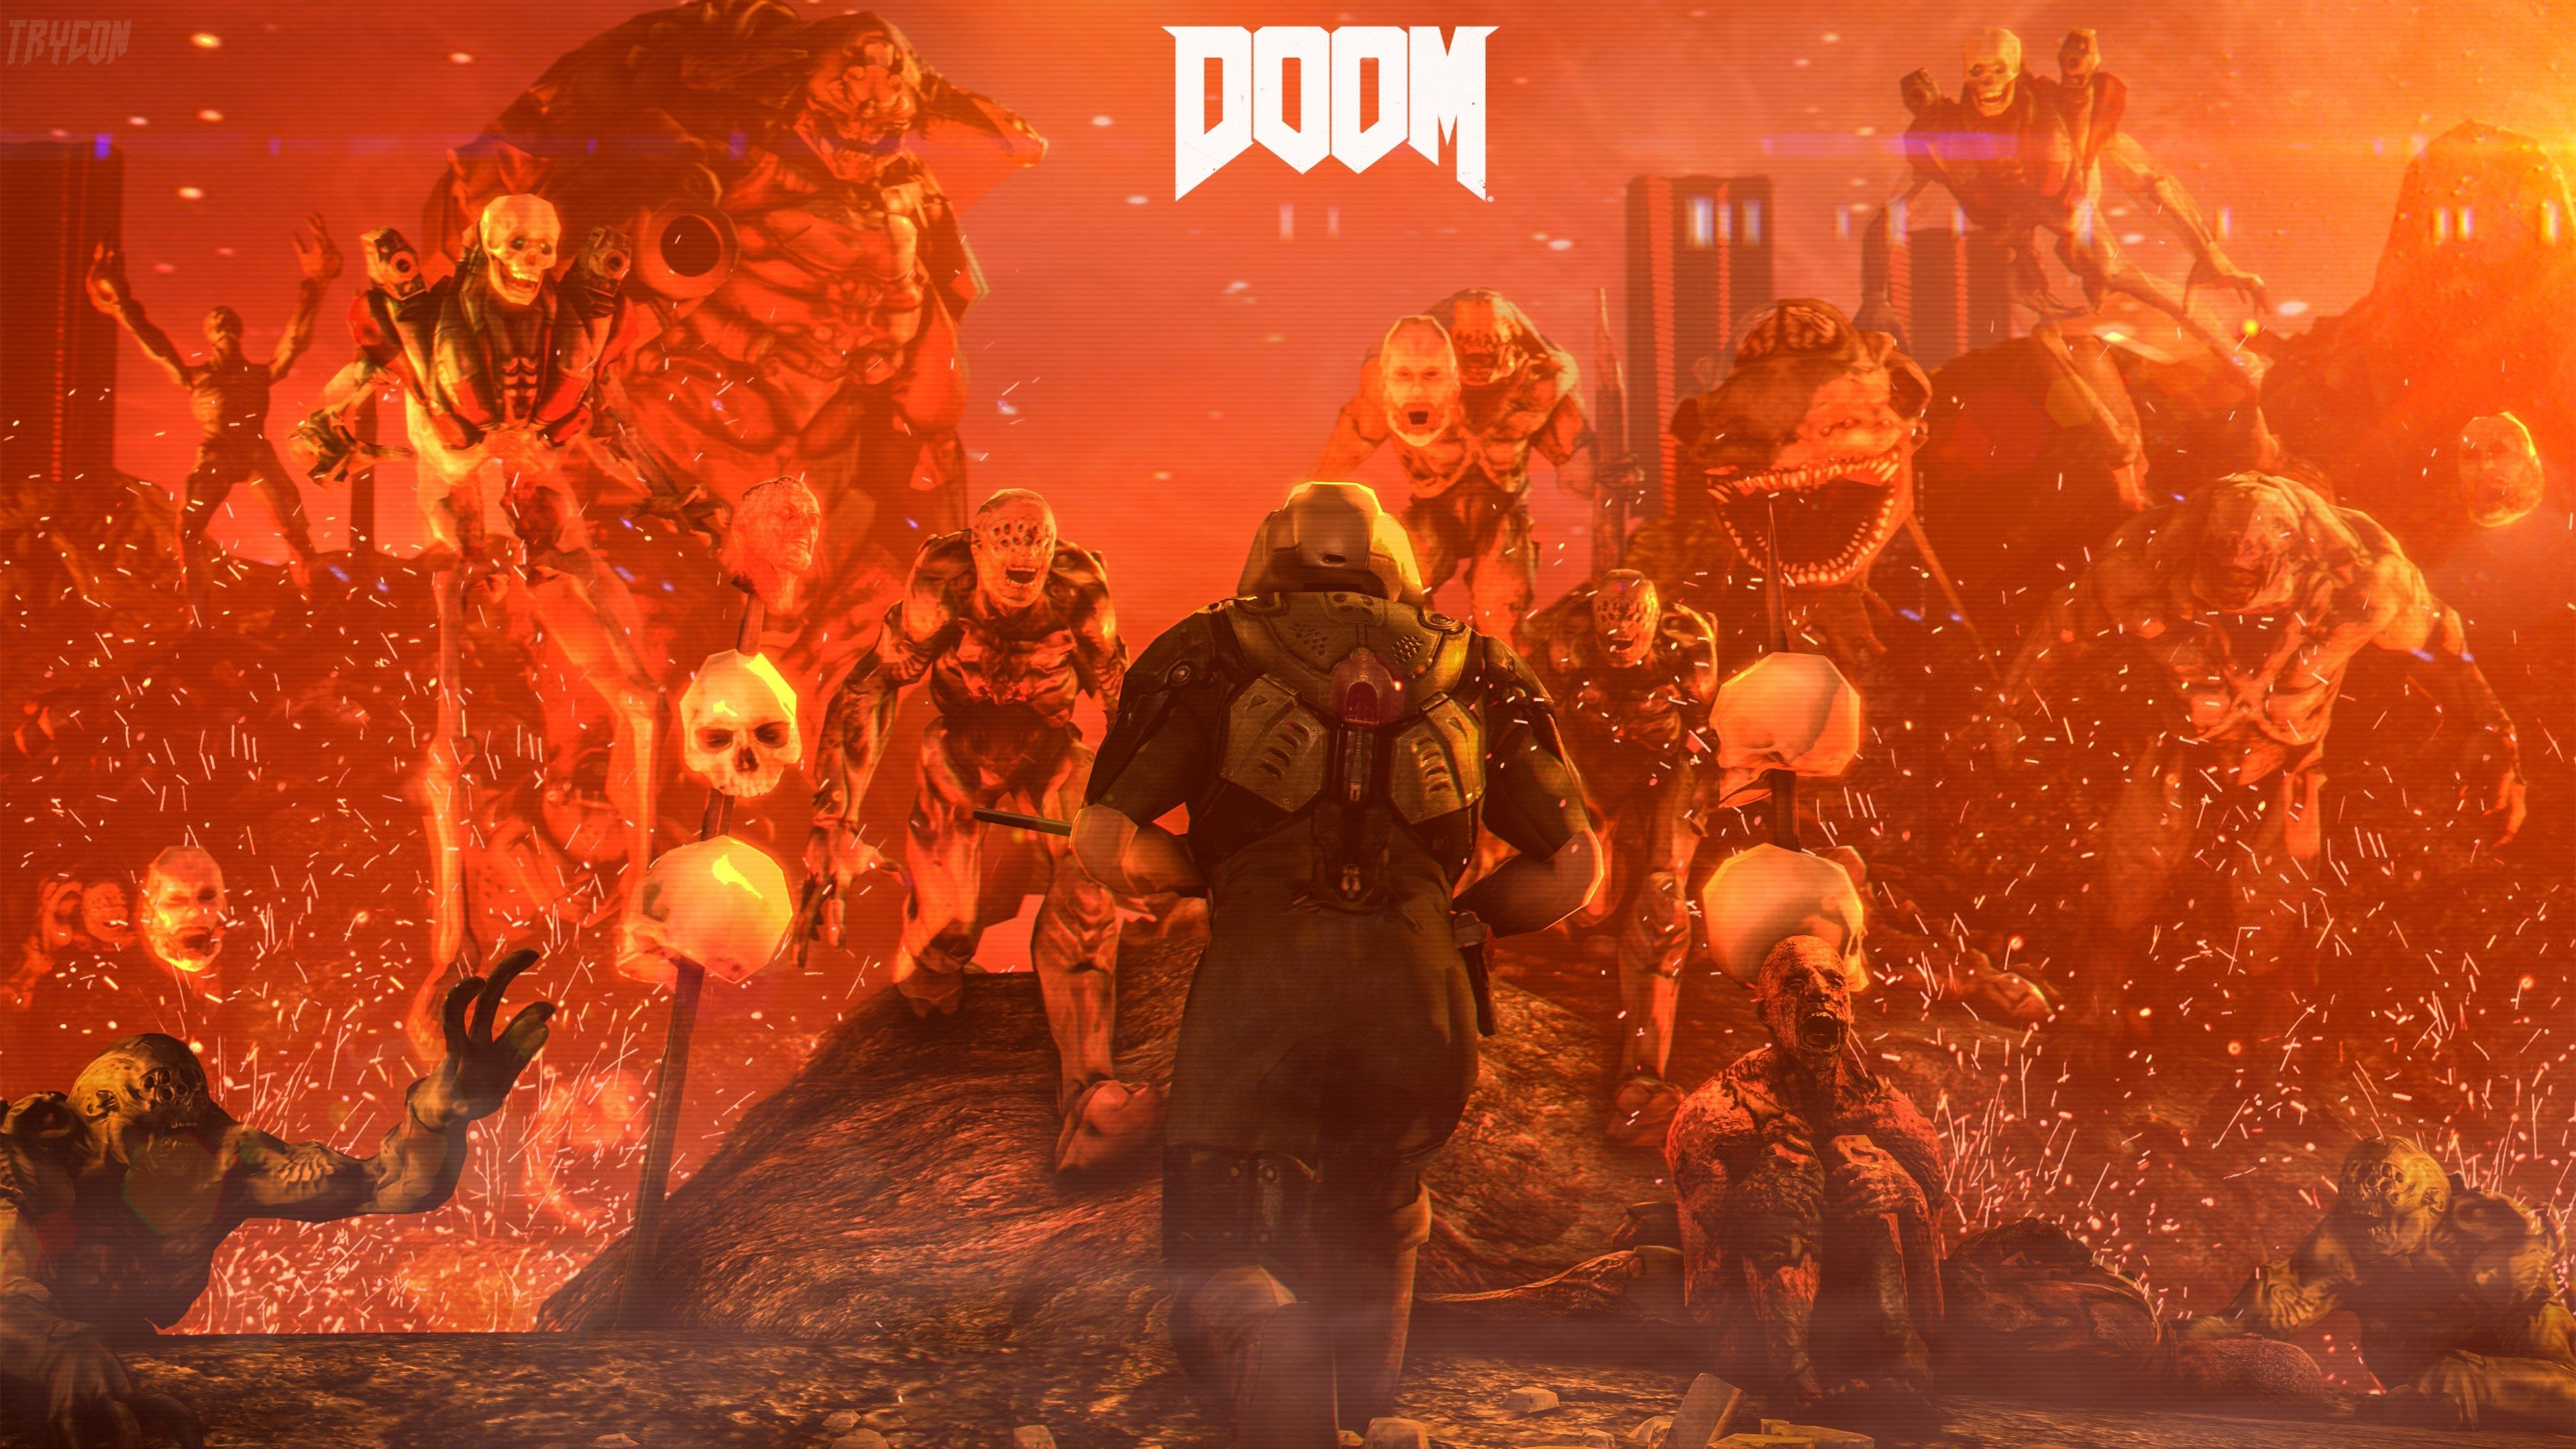 3840x2160 doom 4k background